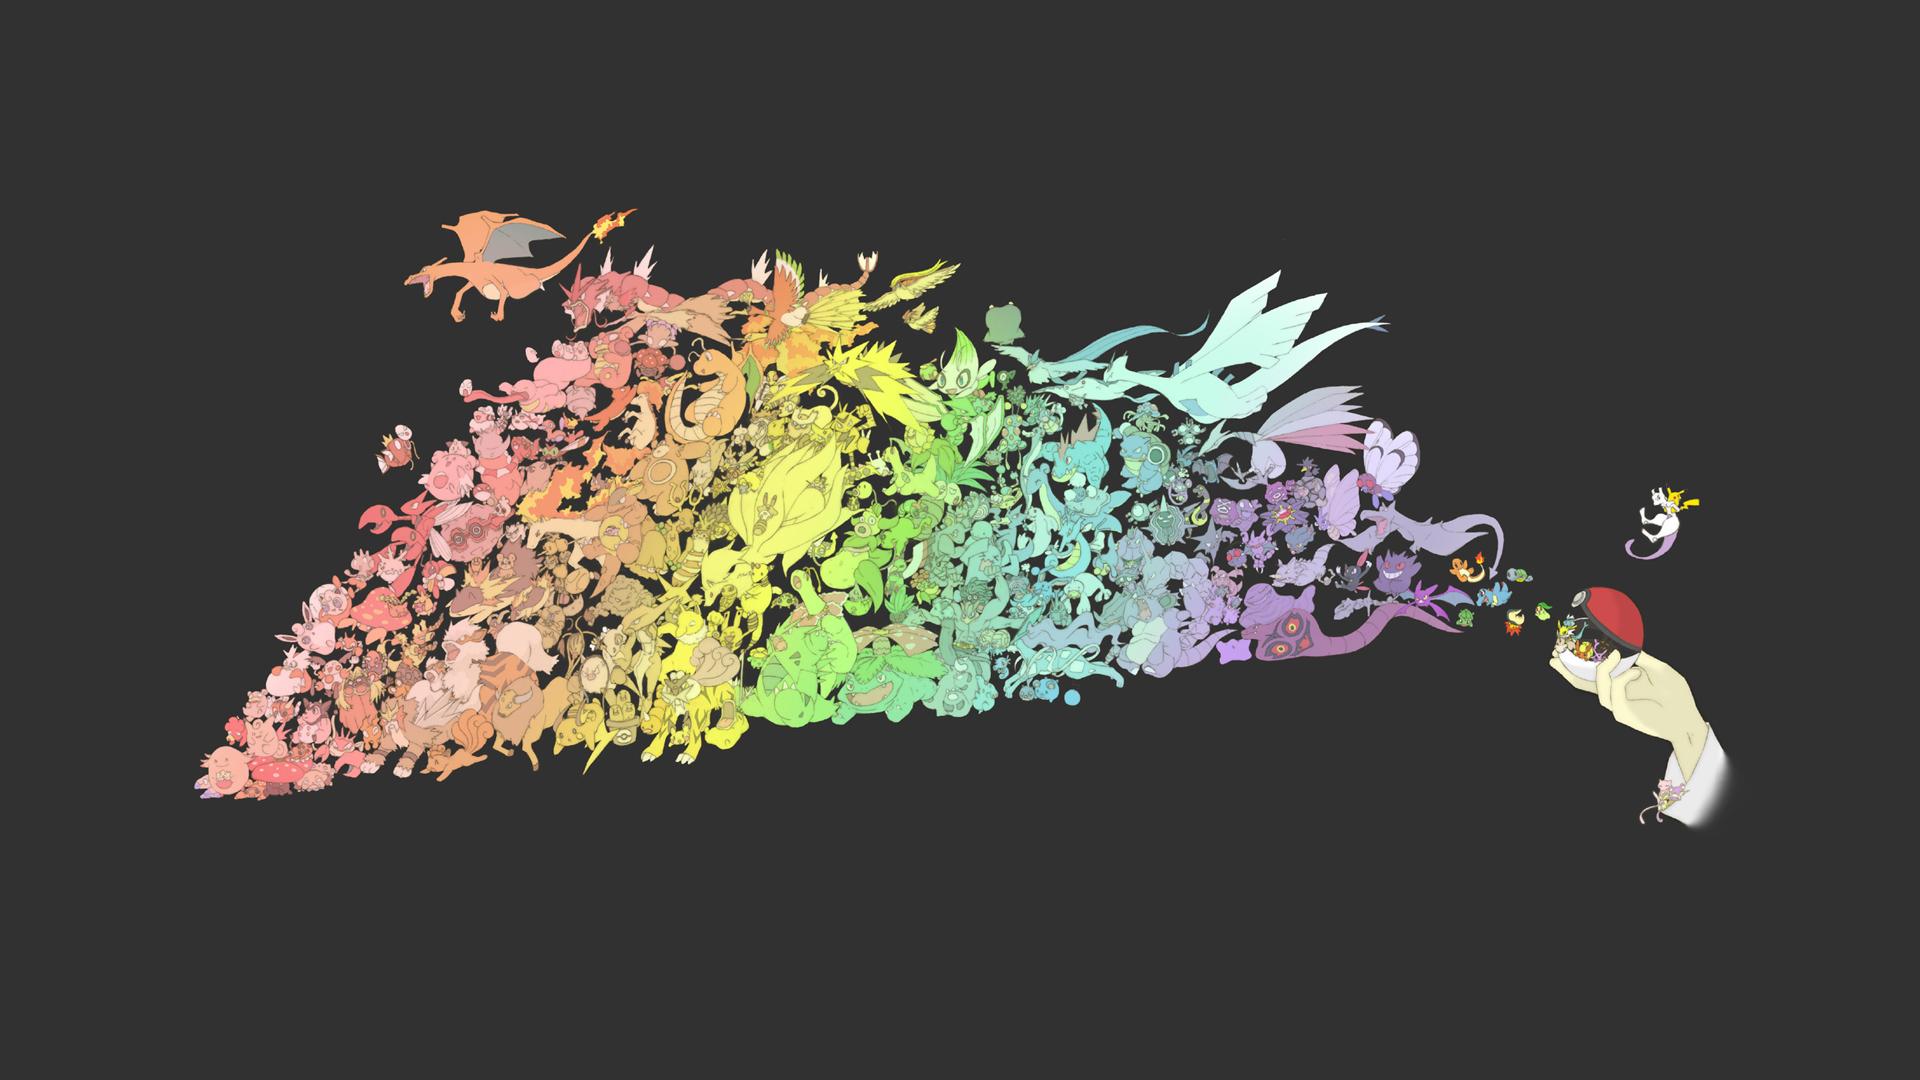 cool pokemon backgrounds wallpapers wallpaper cartoon 1920x1080 1920x1080